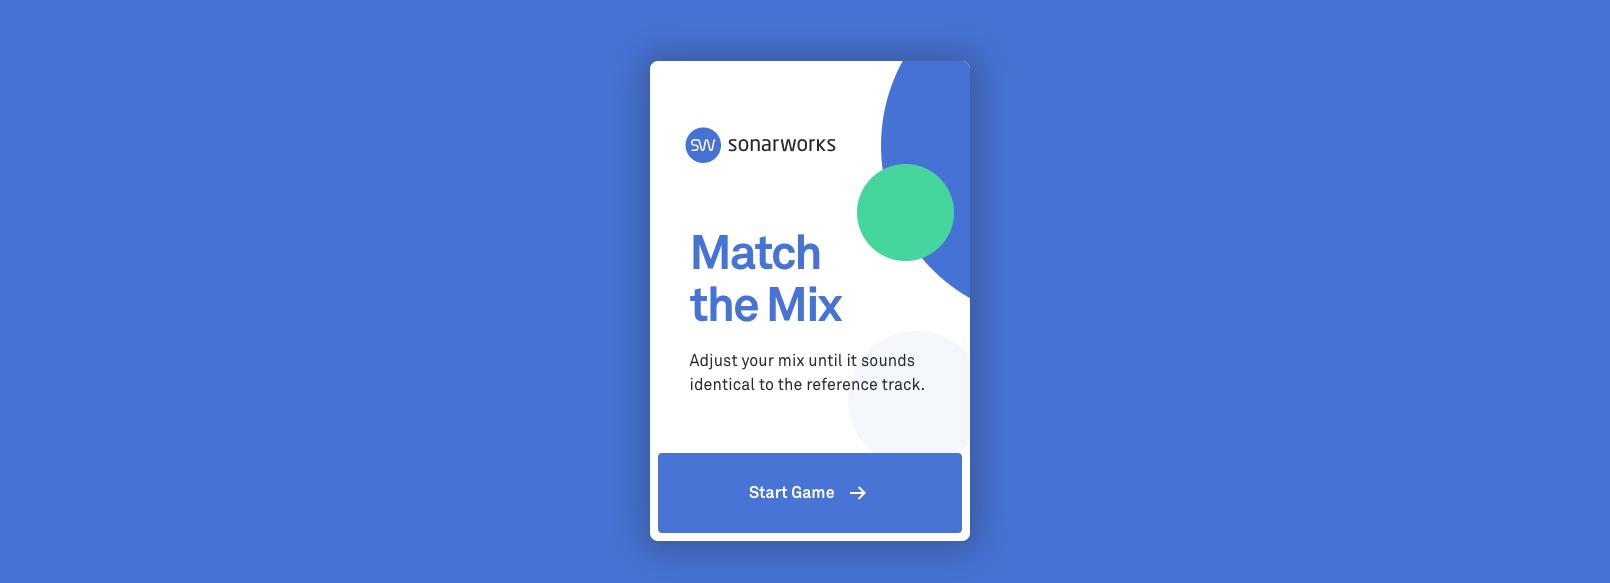 20210730_sonarworks_matchthemix01